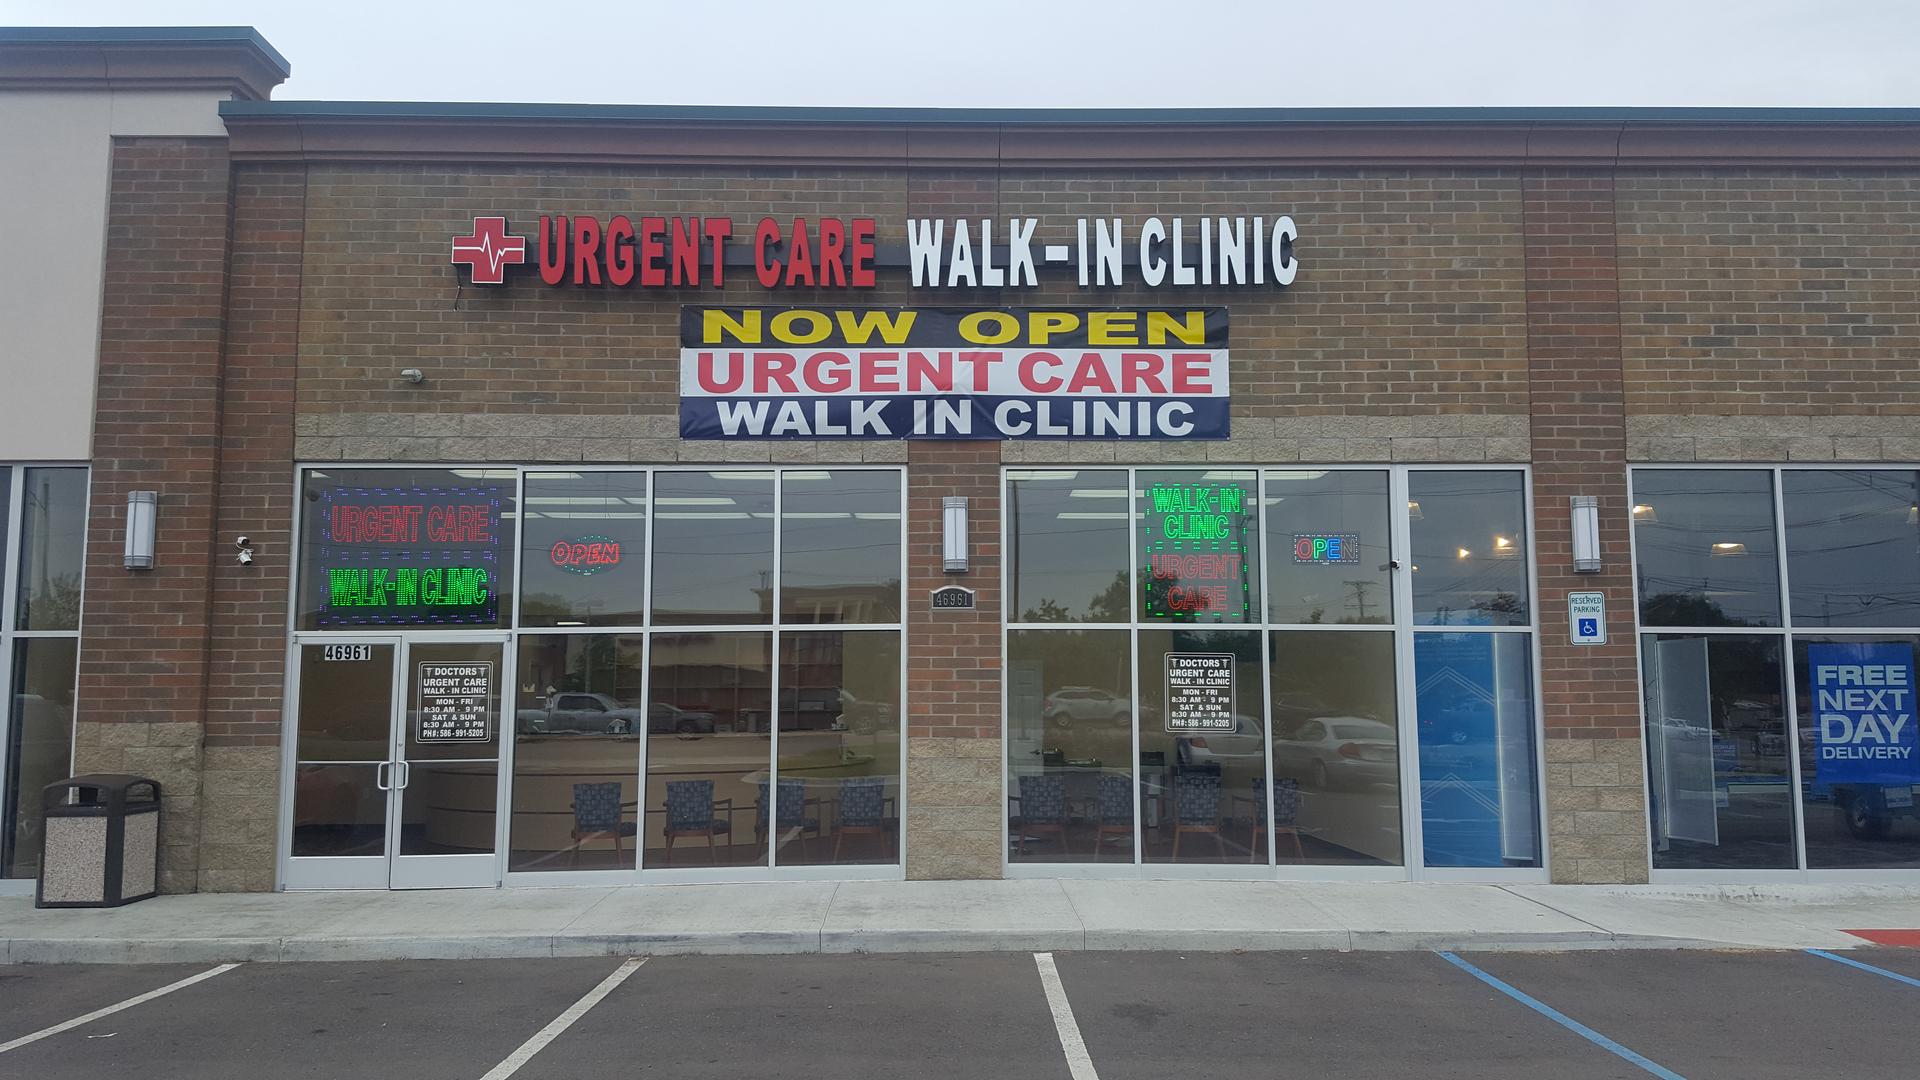 Doctors Urgent Care Walk-in Clinic - Urgent Care Clinic in